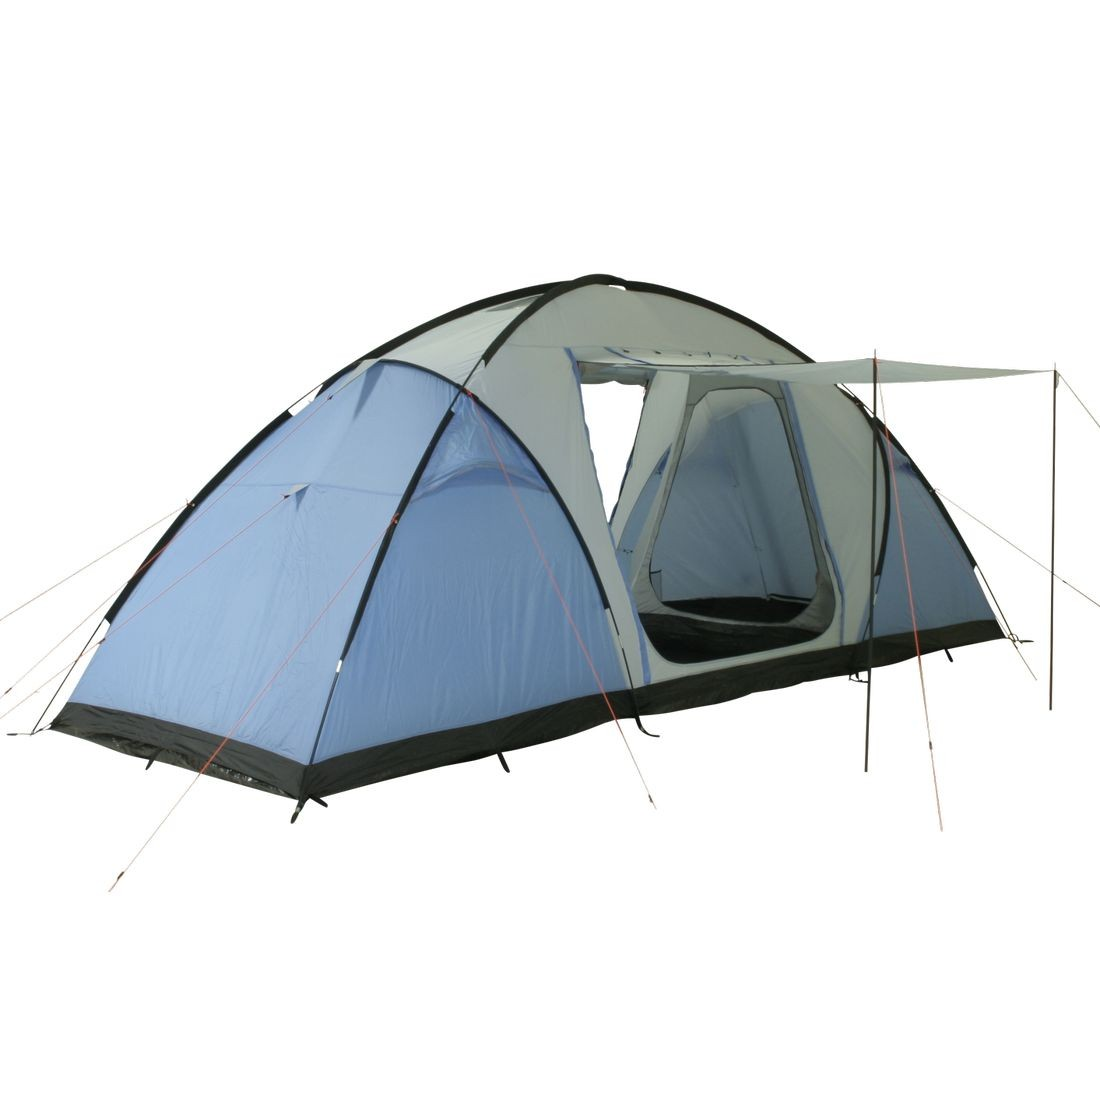 1100x1100 Buy Camping Tents